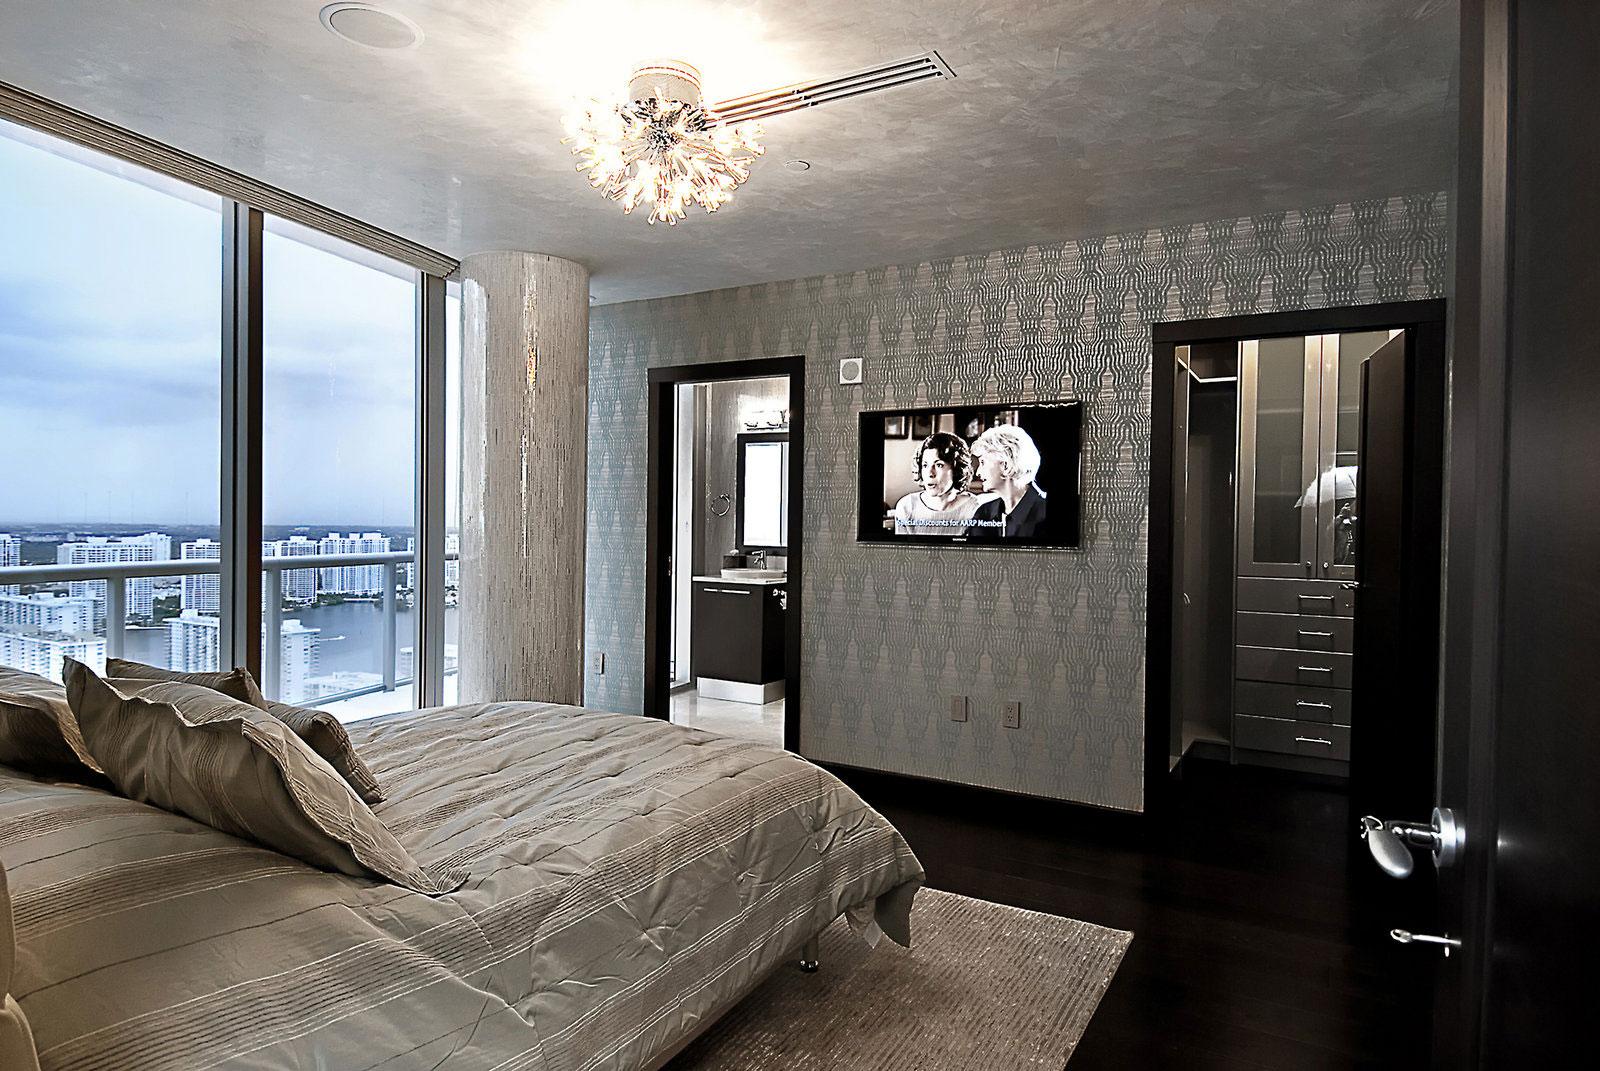 Jade ocean penthouse by pfuner design homedezen for Jade ocean penthouse